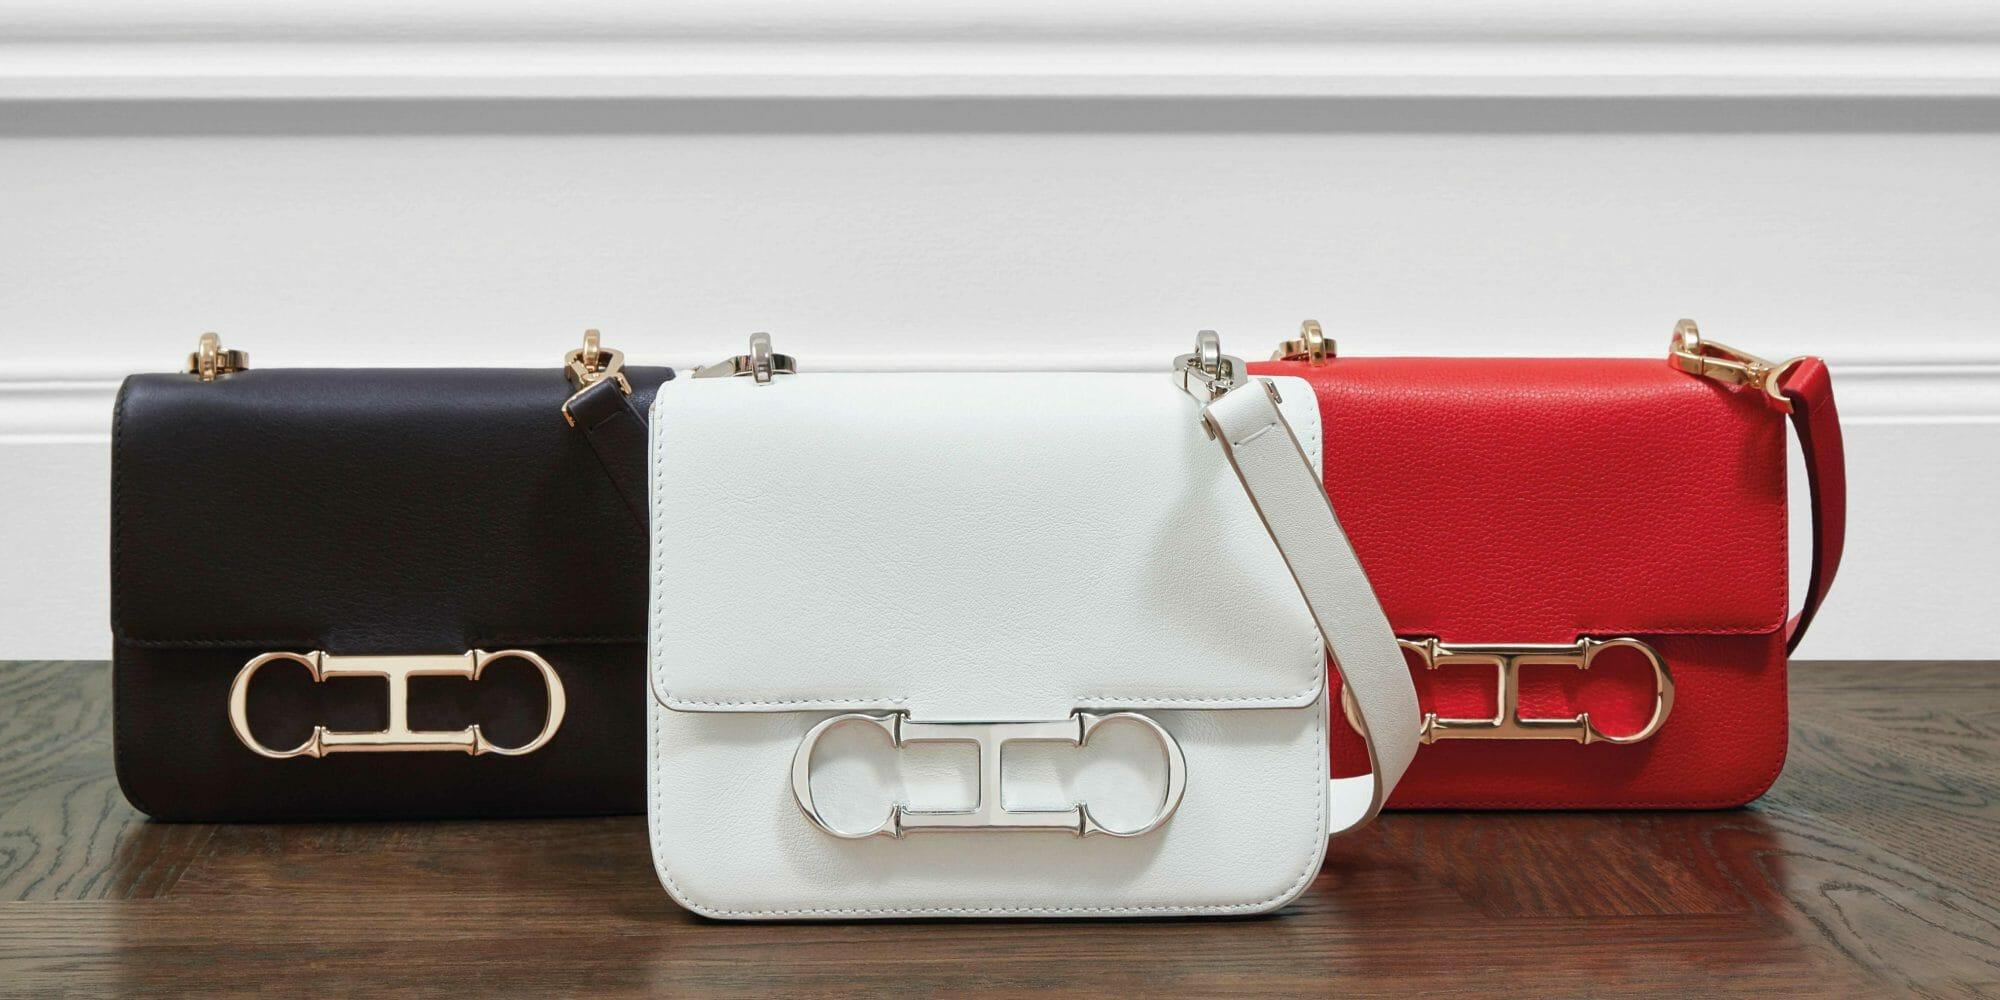 ch-carolina-herrera-fashion-bags-homepage-banner-image-insignia